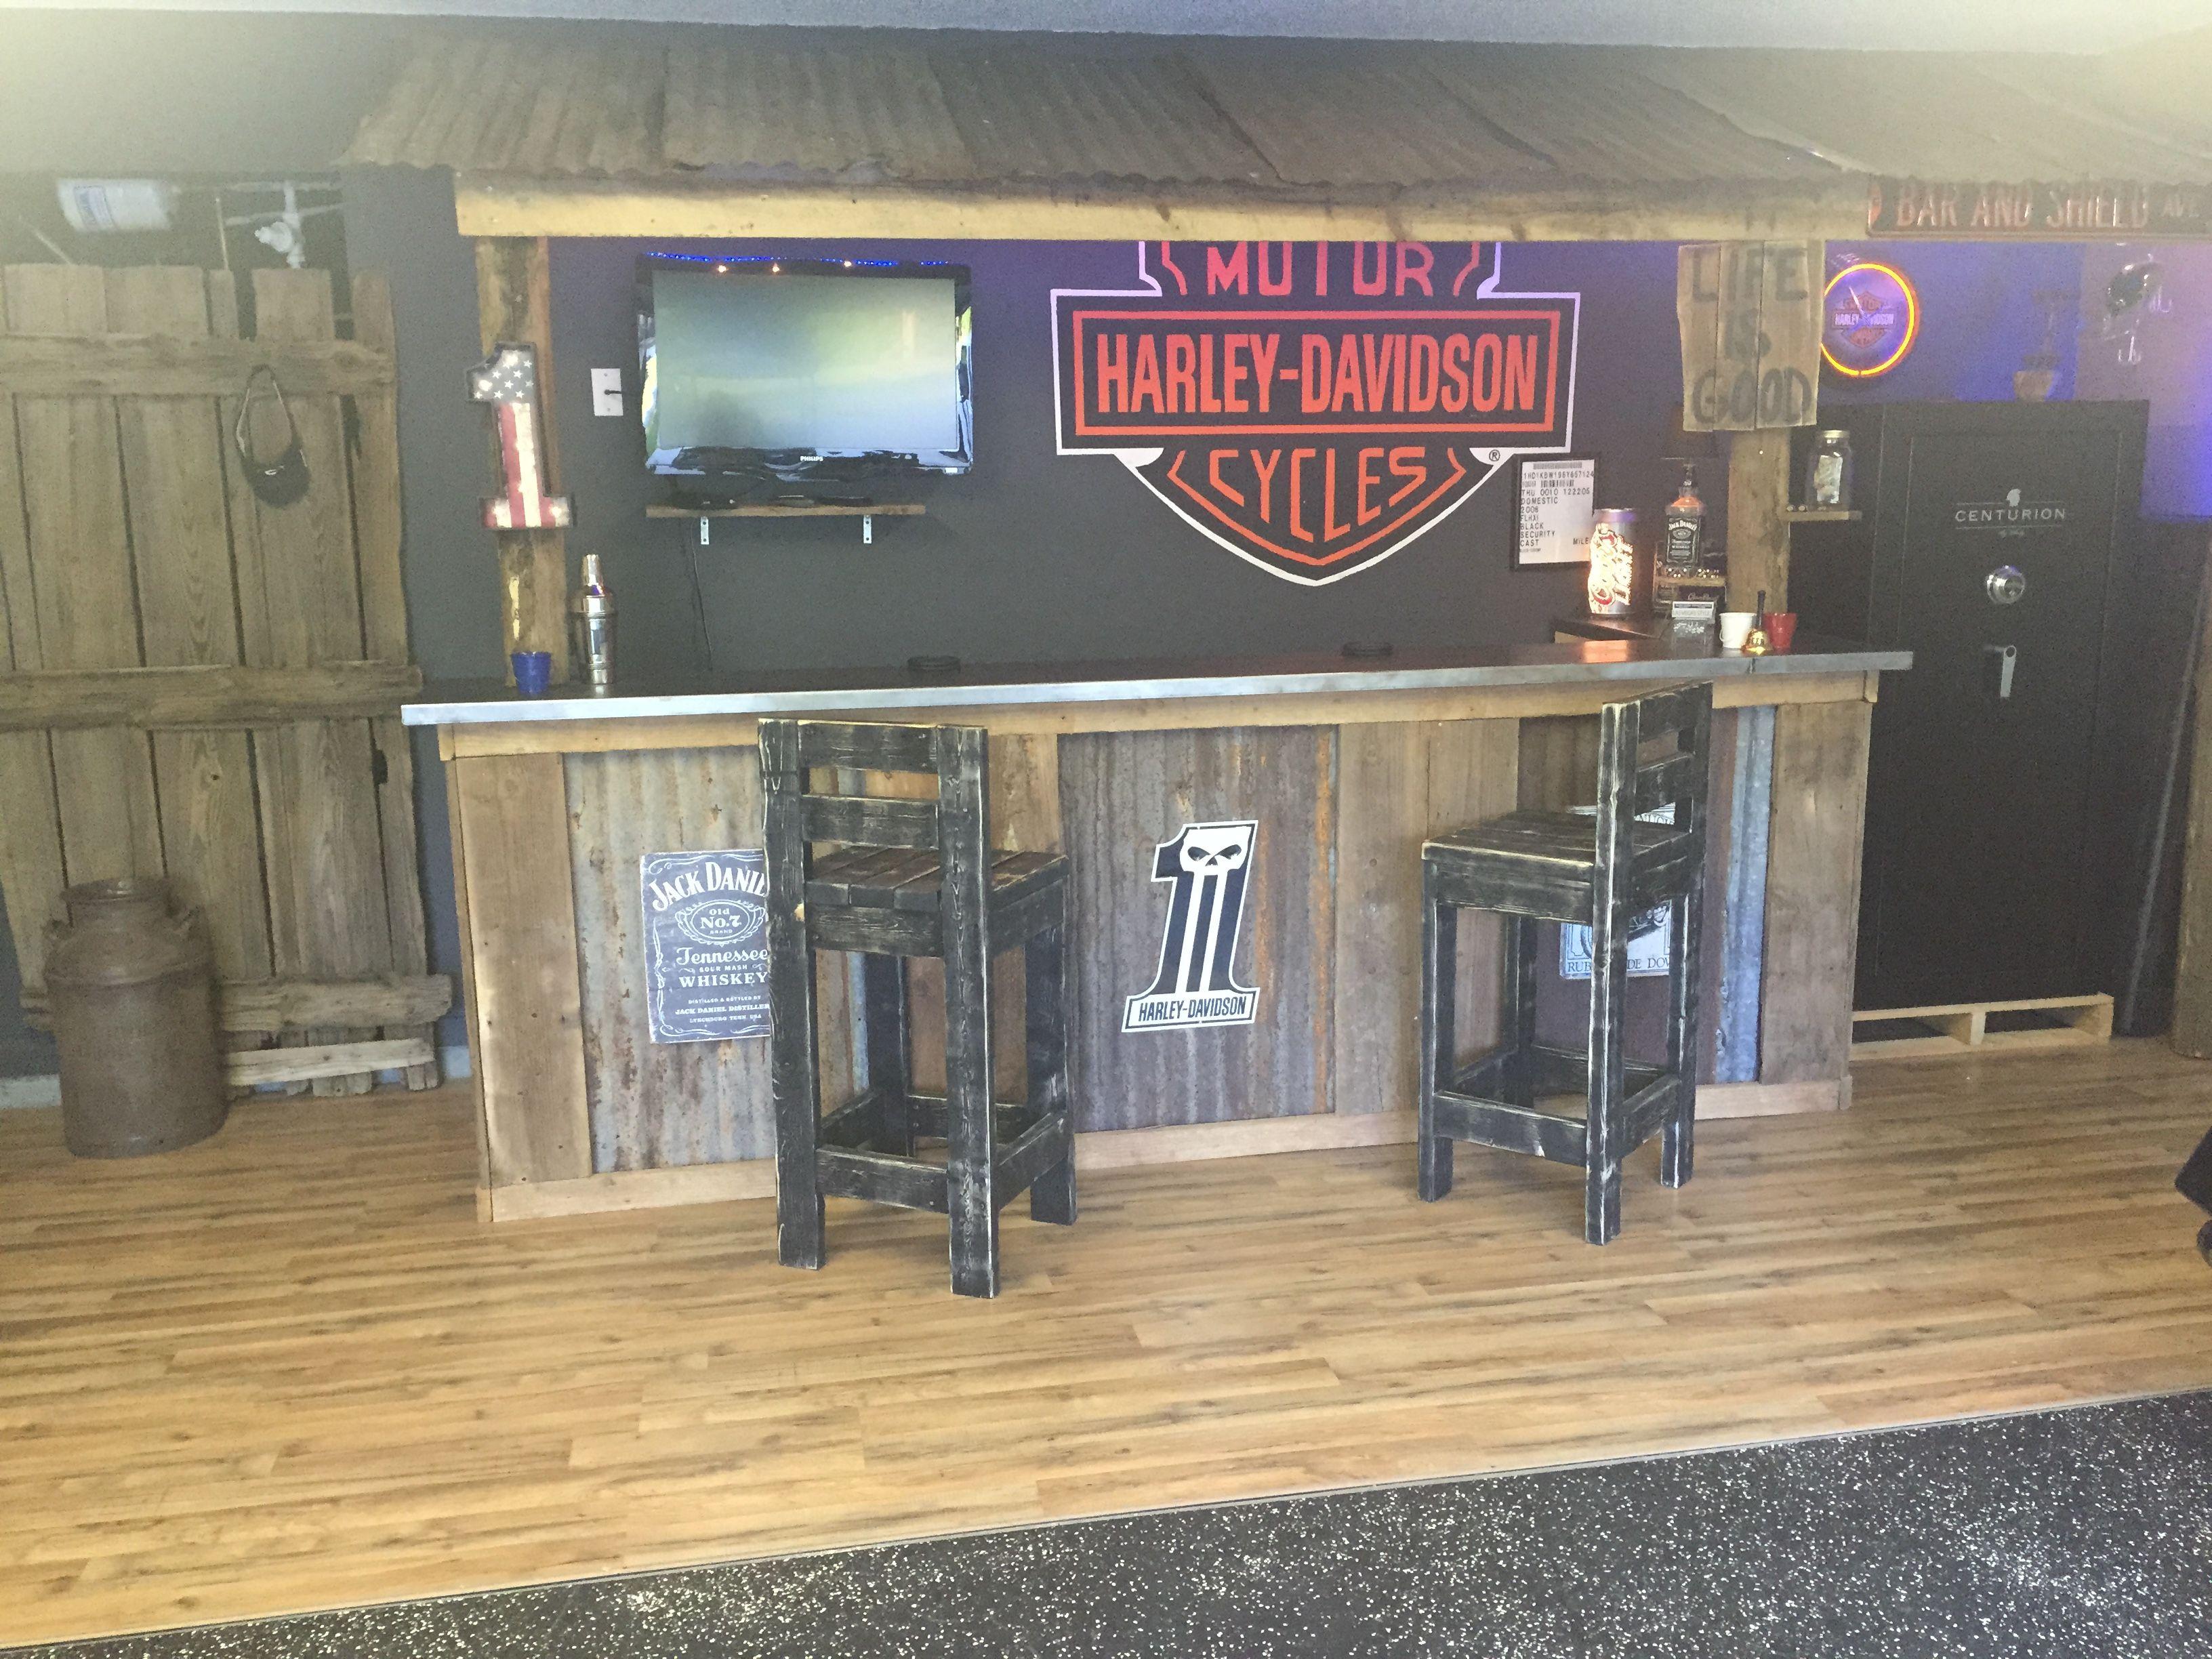 Harley-Davidson Man Cave Bar